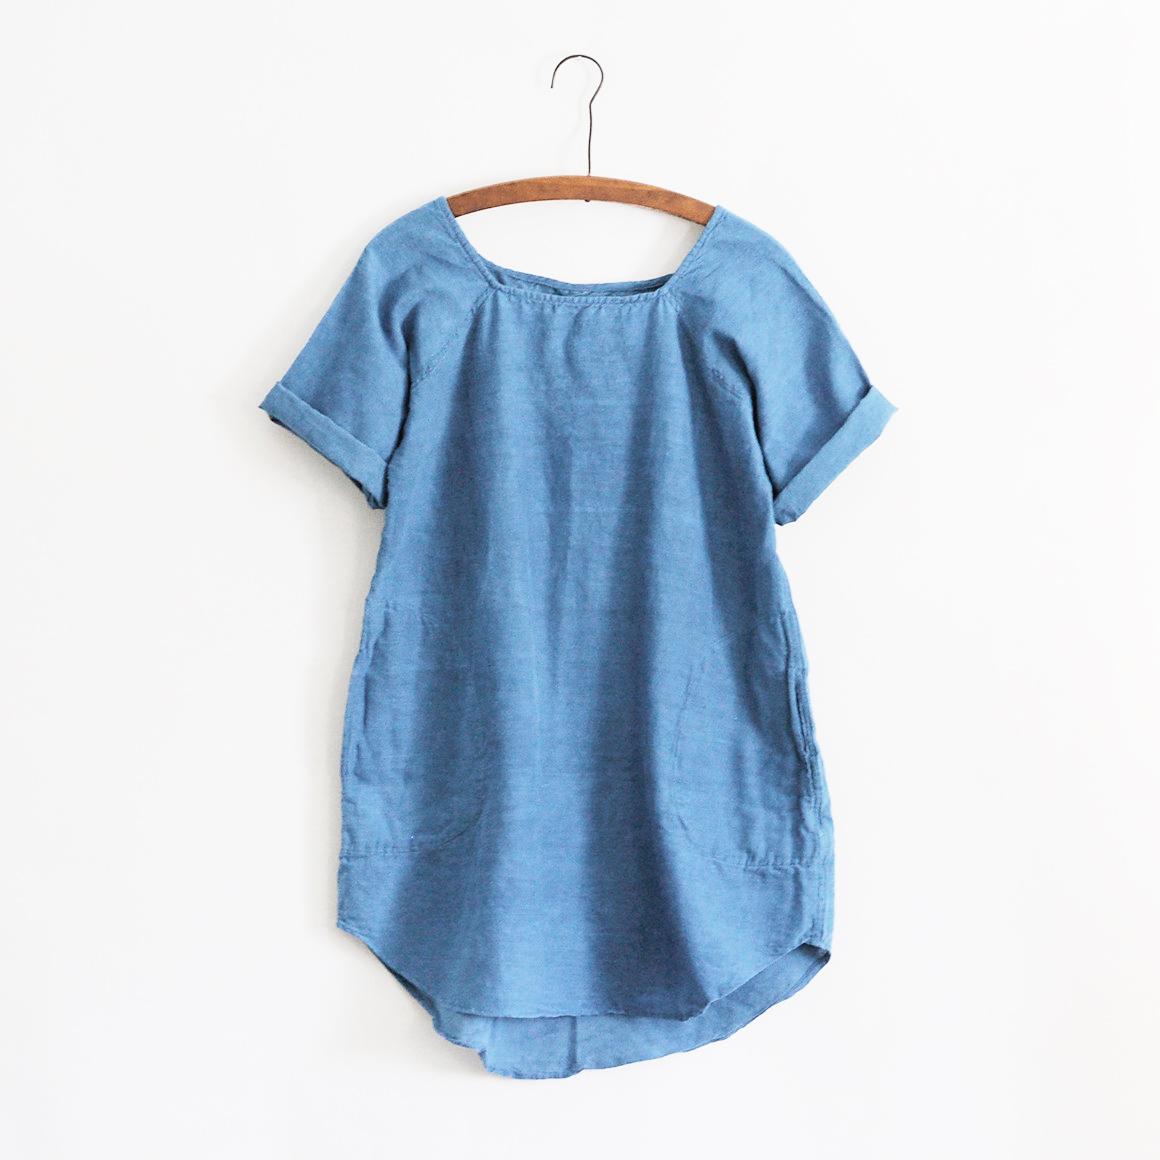 Natural indigo tunic by Pippa Romana studio. Handspun khadi cotton fibers.